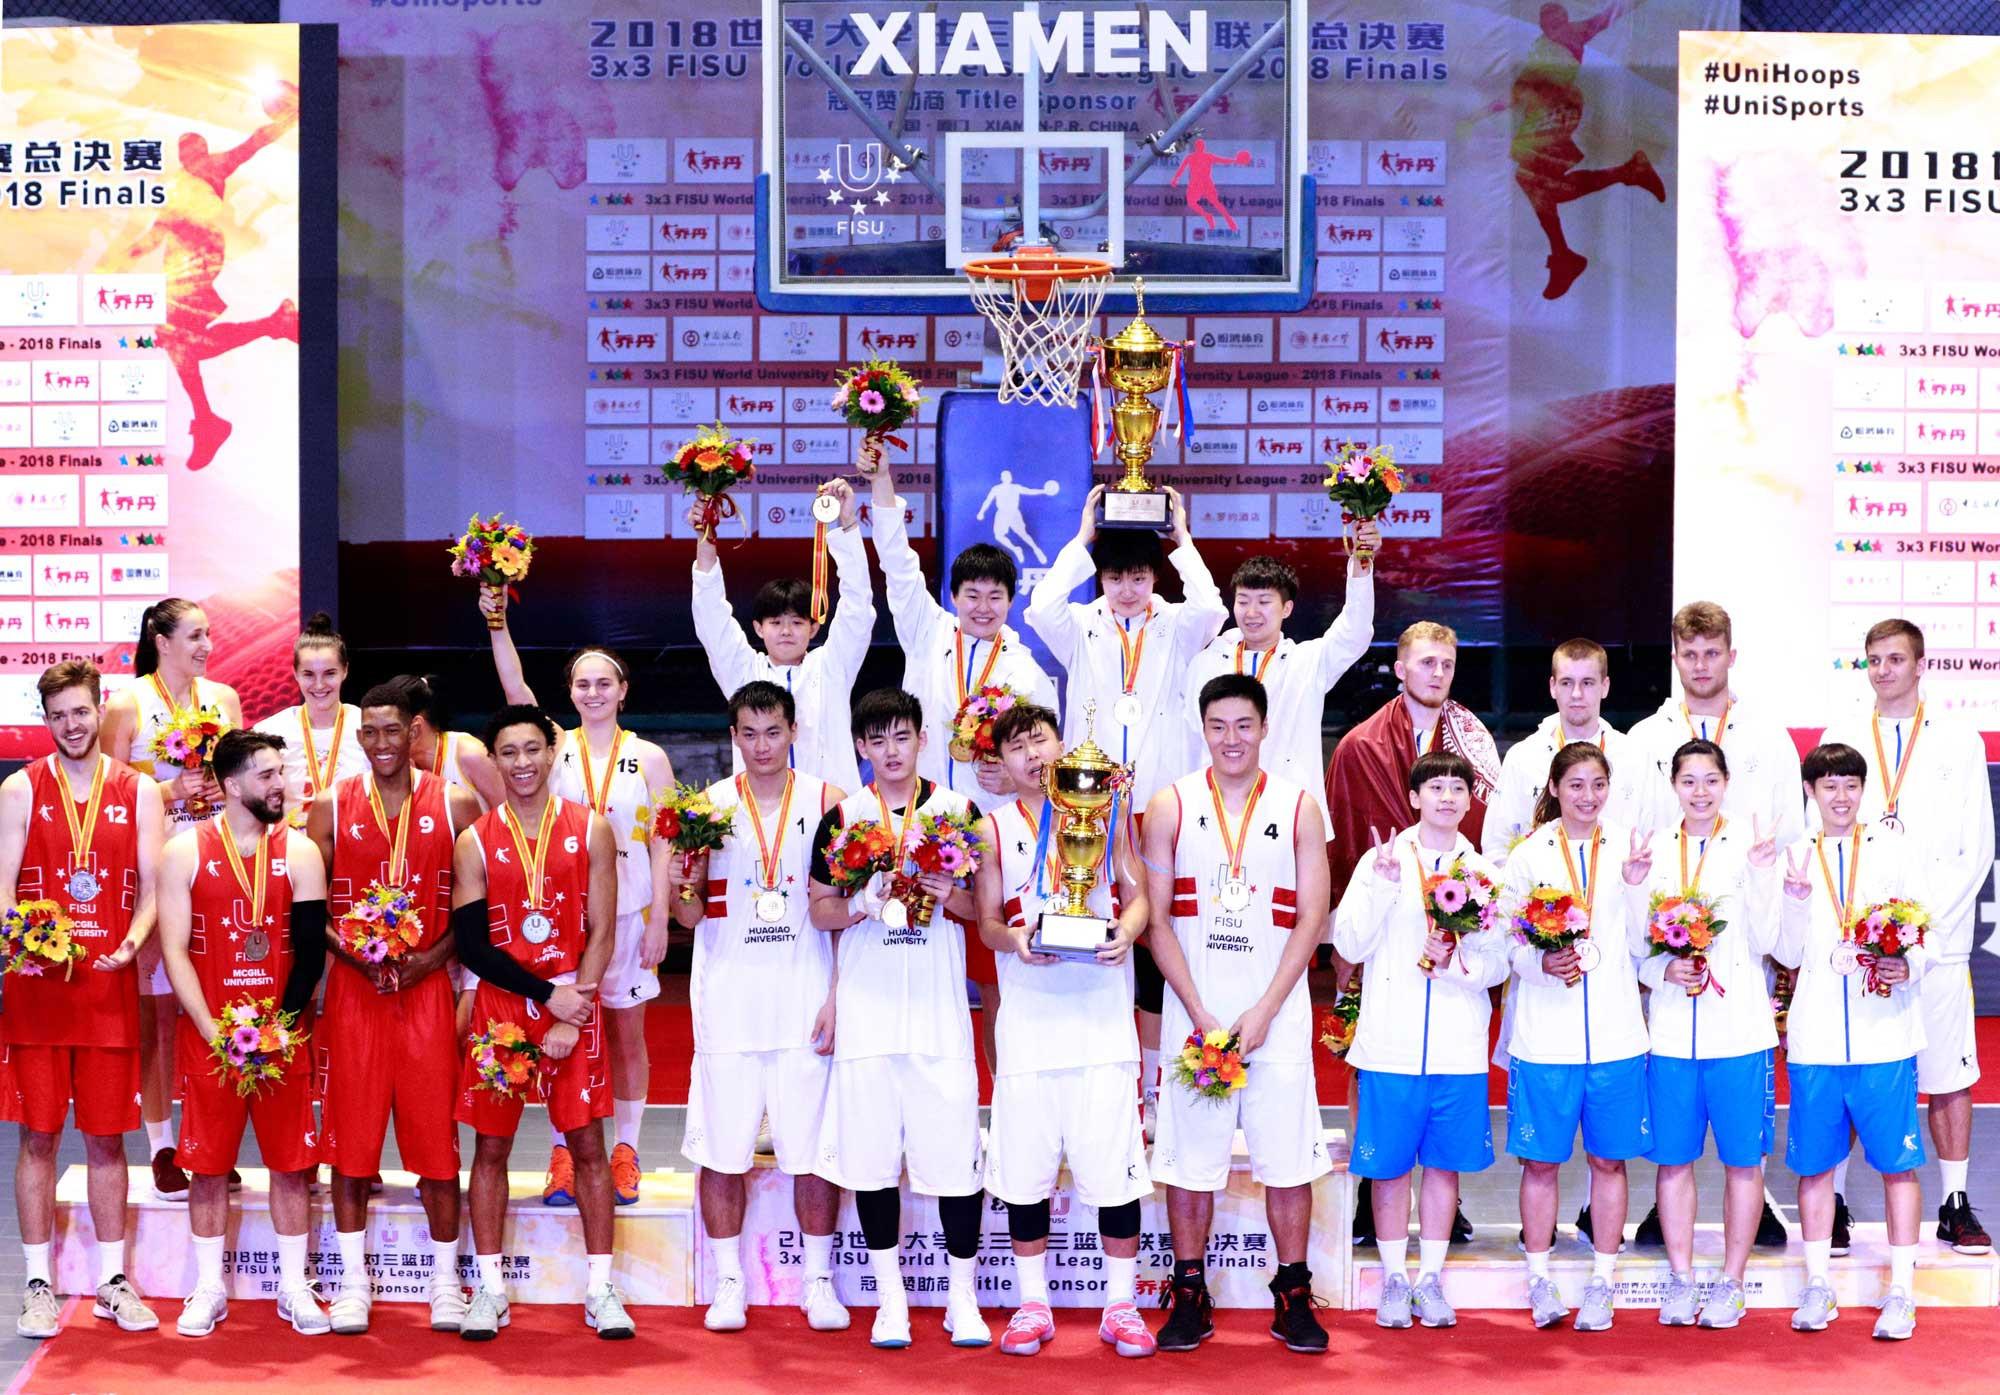 The complete final podium for the 3x3 FISU World University League Finals ©FISU